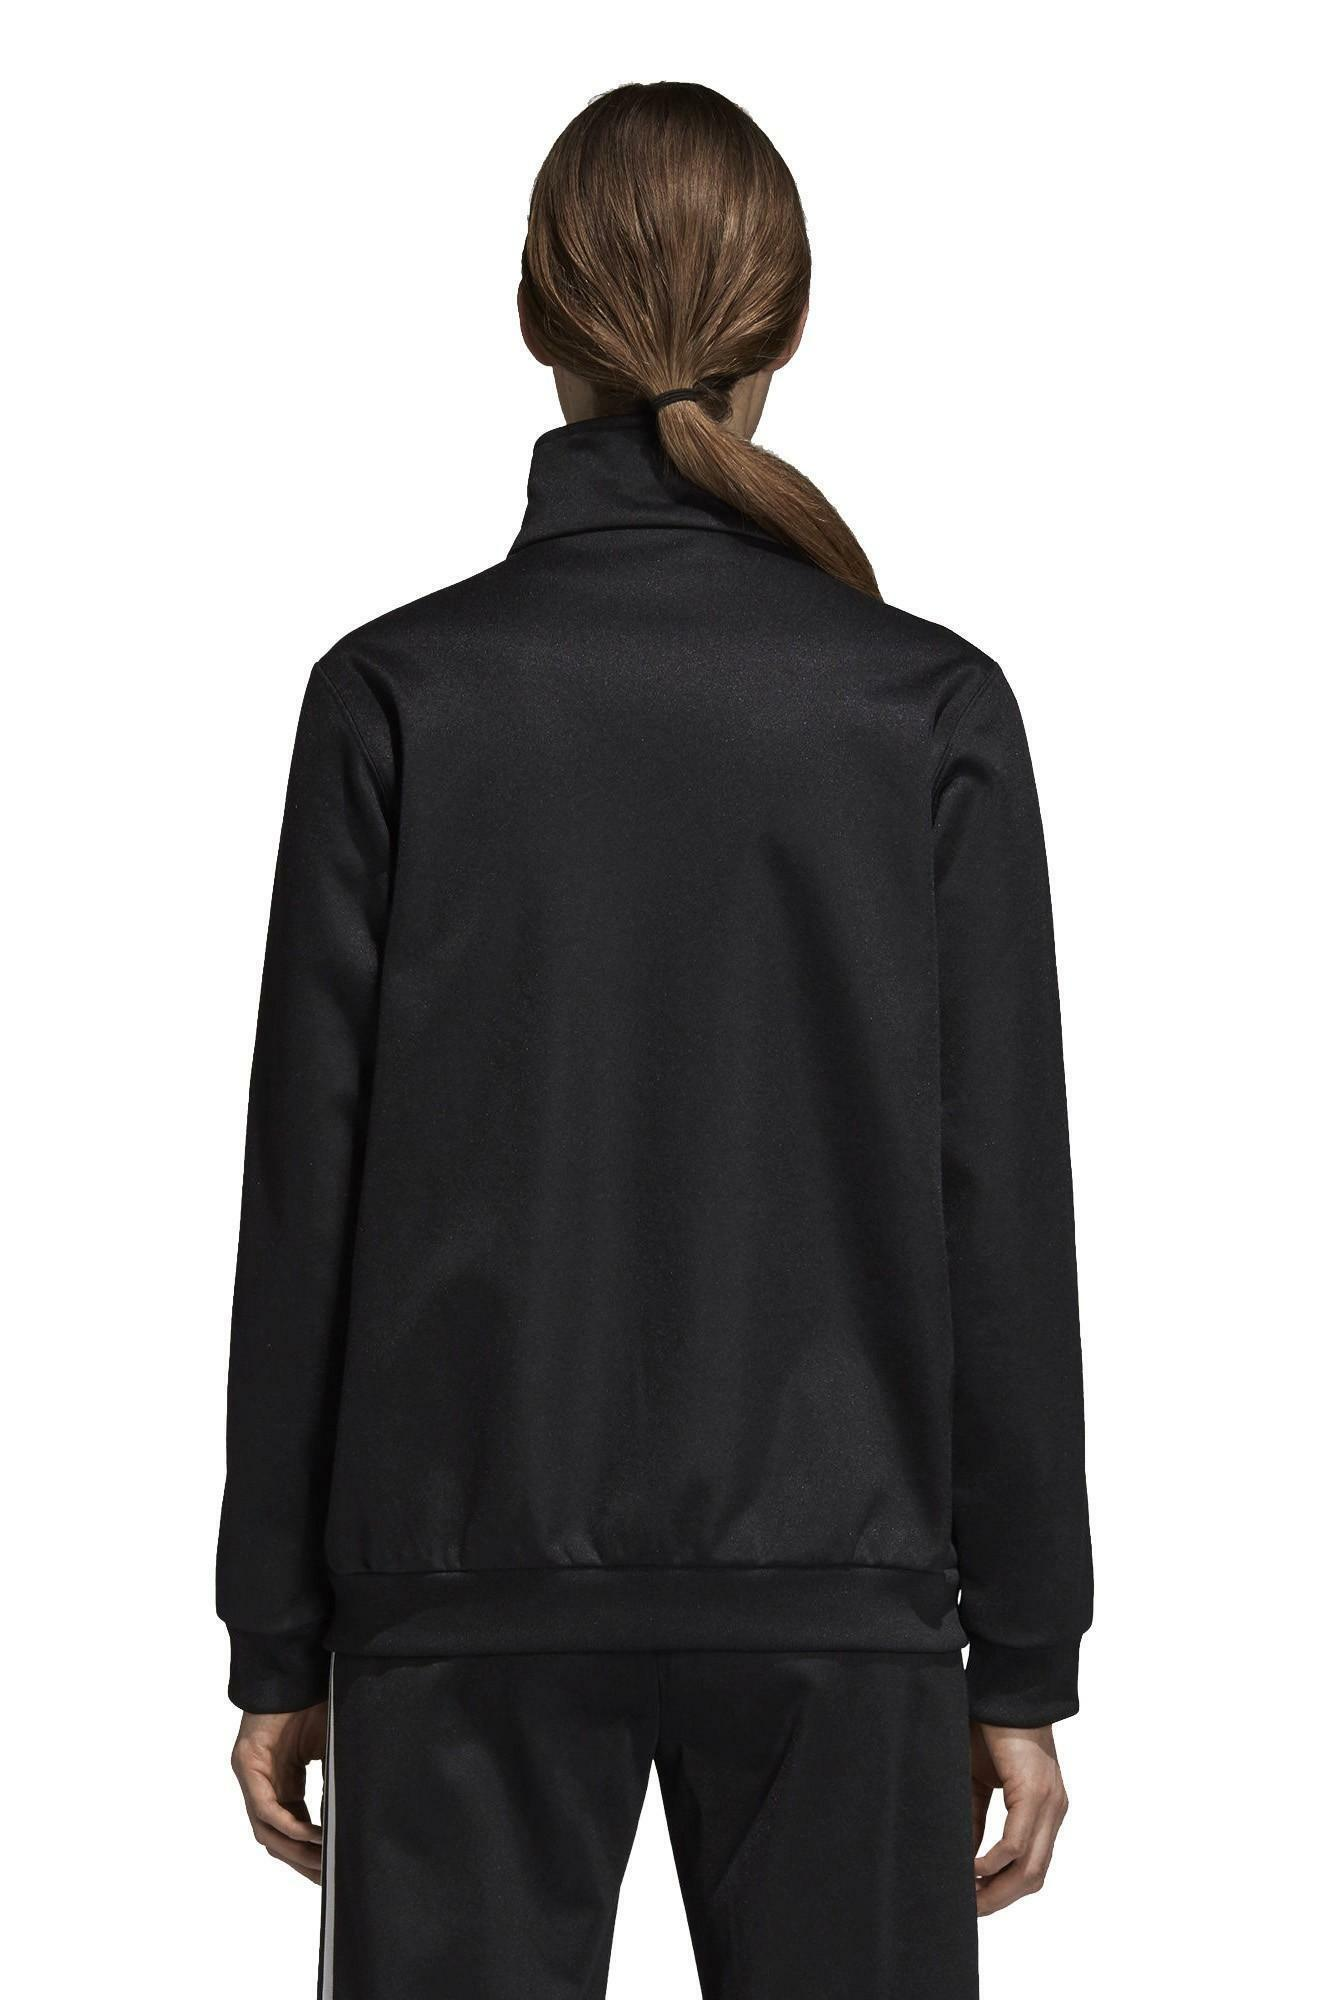 adidas adidas contemp bb tt giacchetto donna nero dh3192